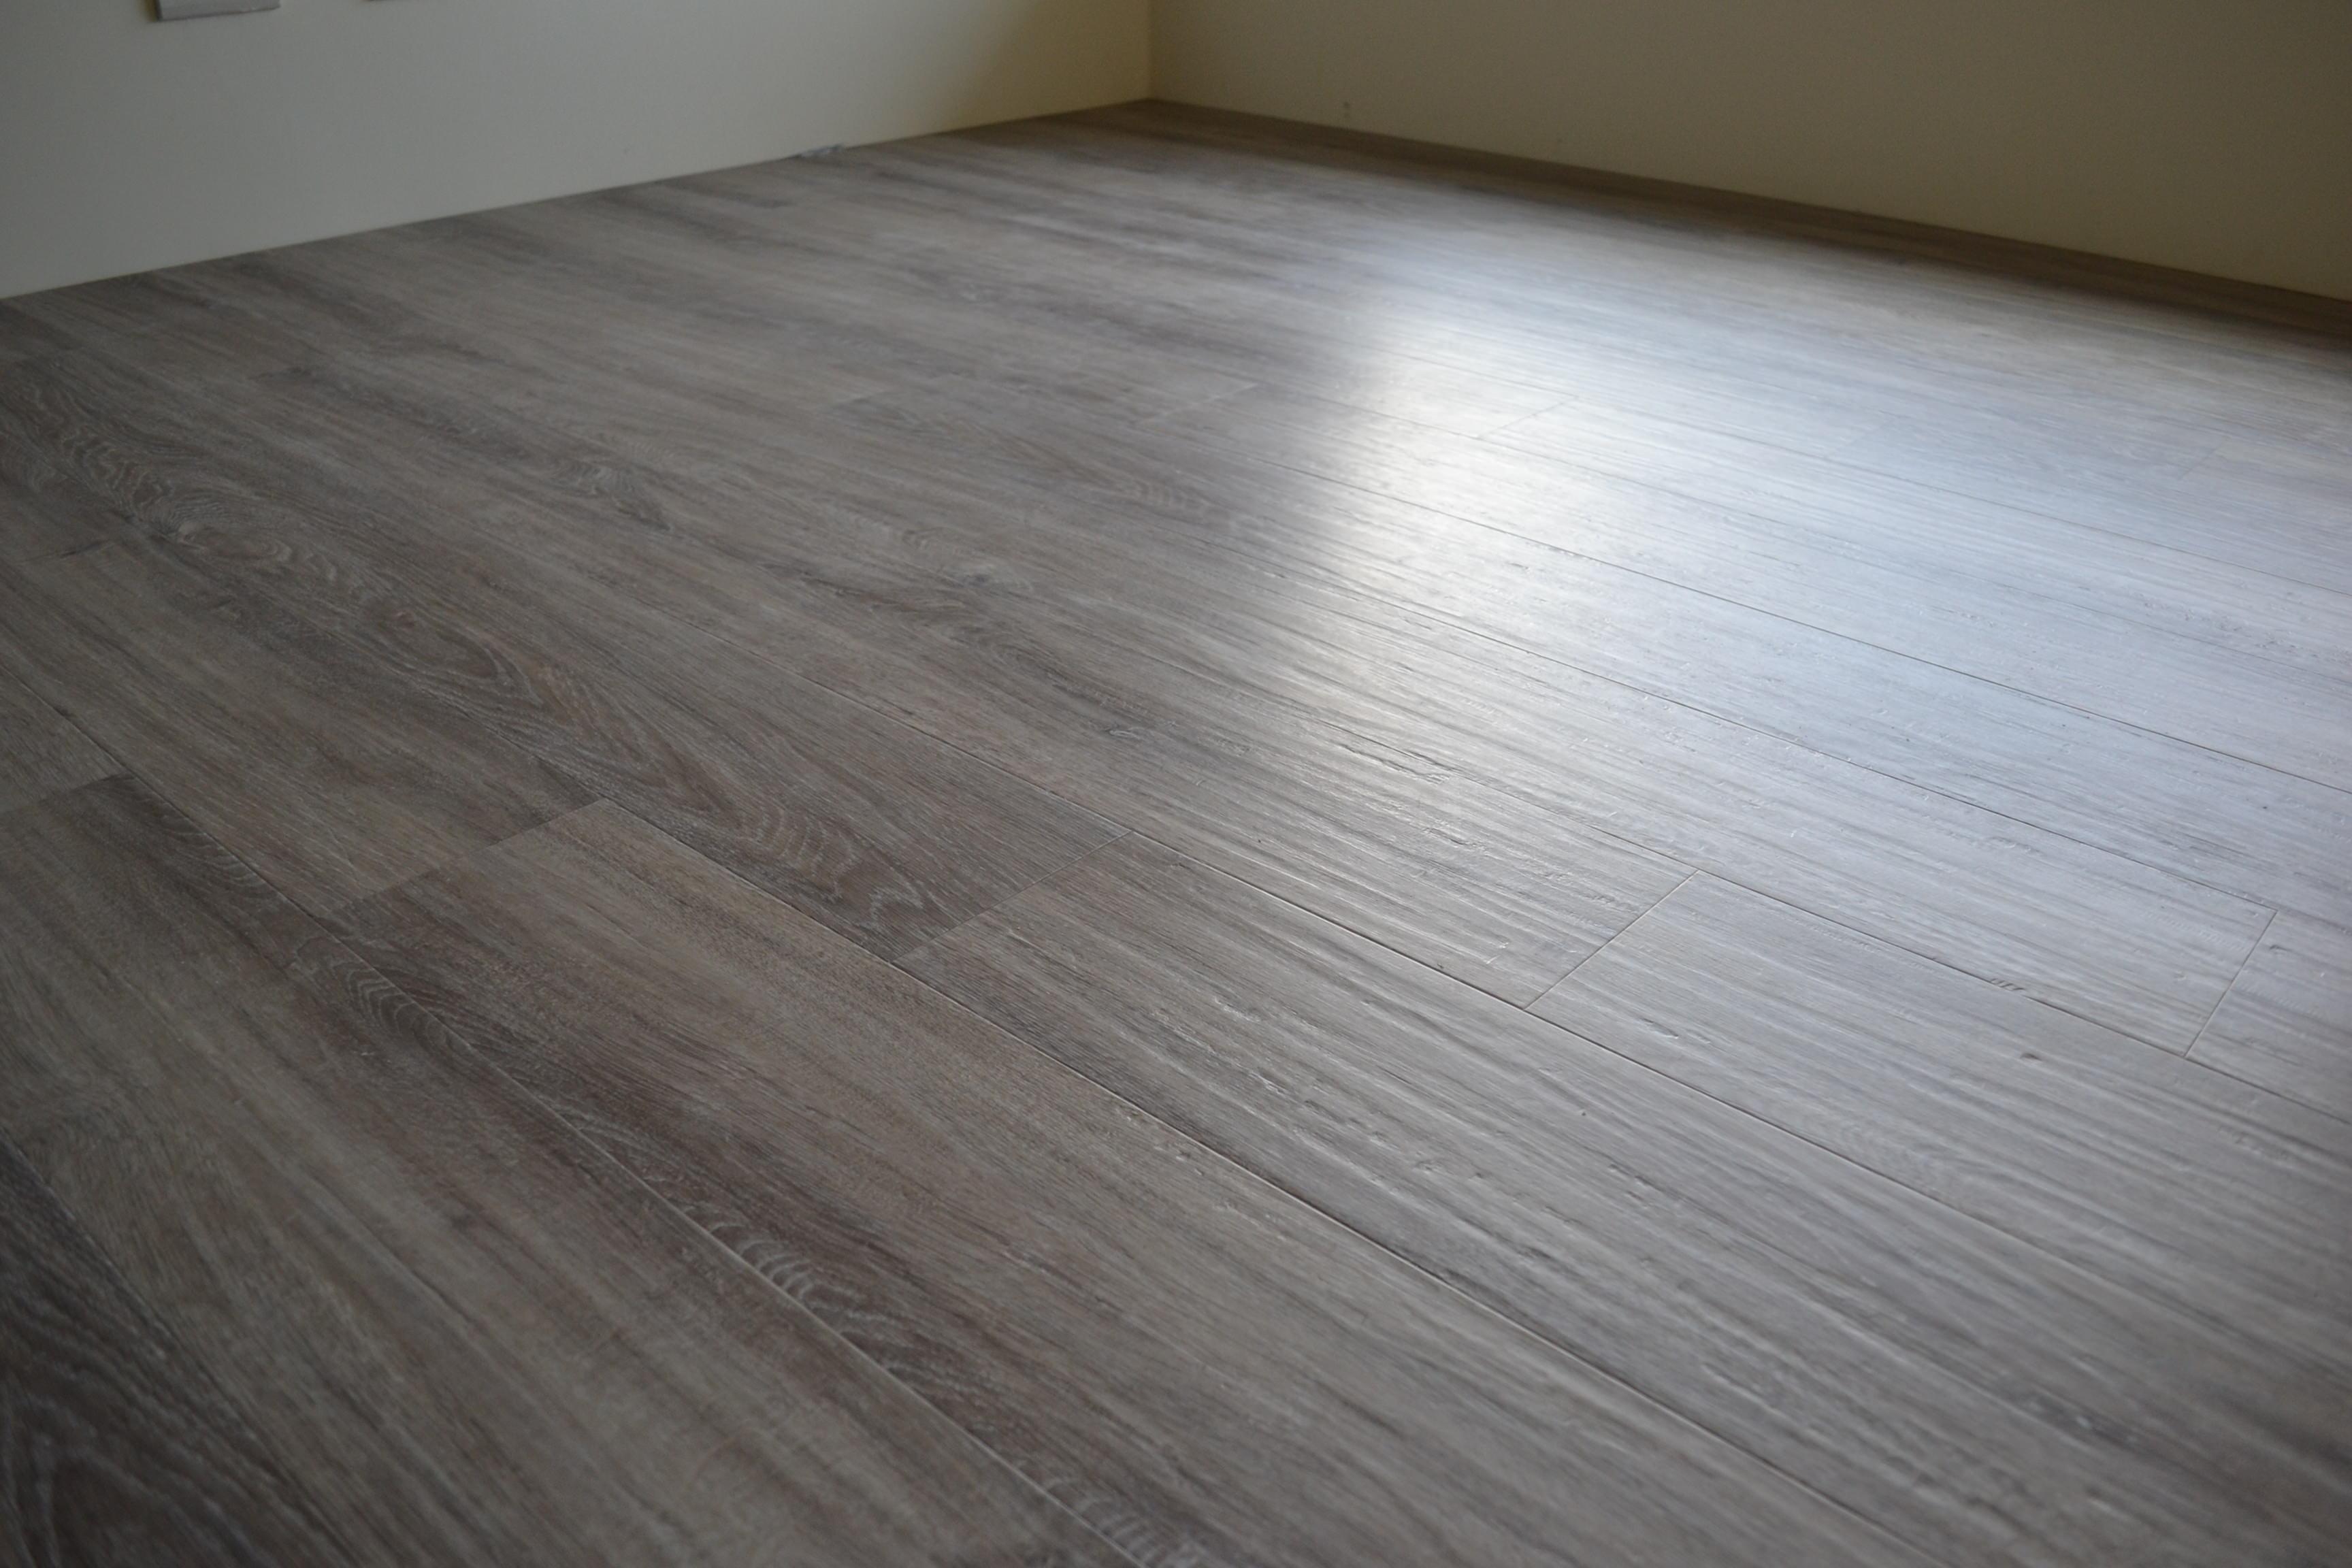 MeiJer WPC高密度木塑鎖扣超耐磨地板 6202 灰色橡木 Oak Pastel-Grey (3)